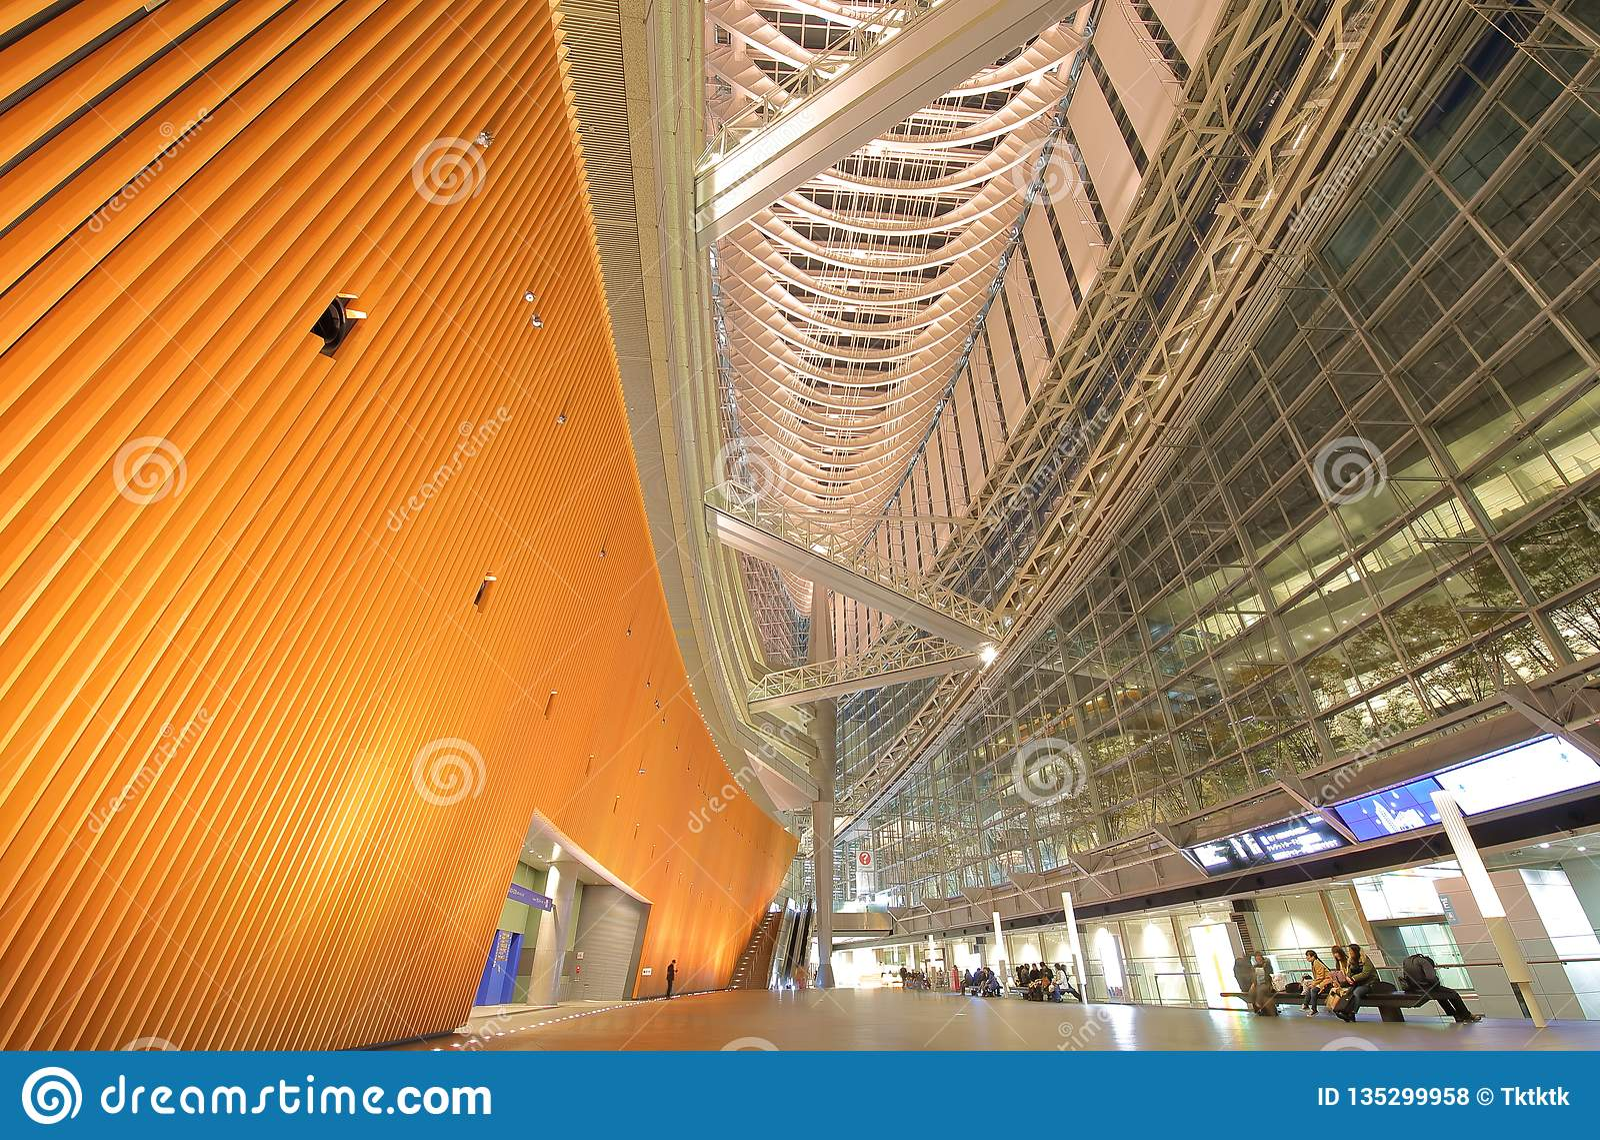 Tokyo international forum modern architecture building Japan